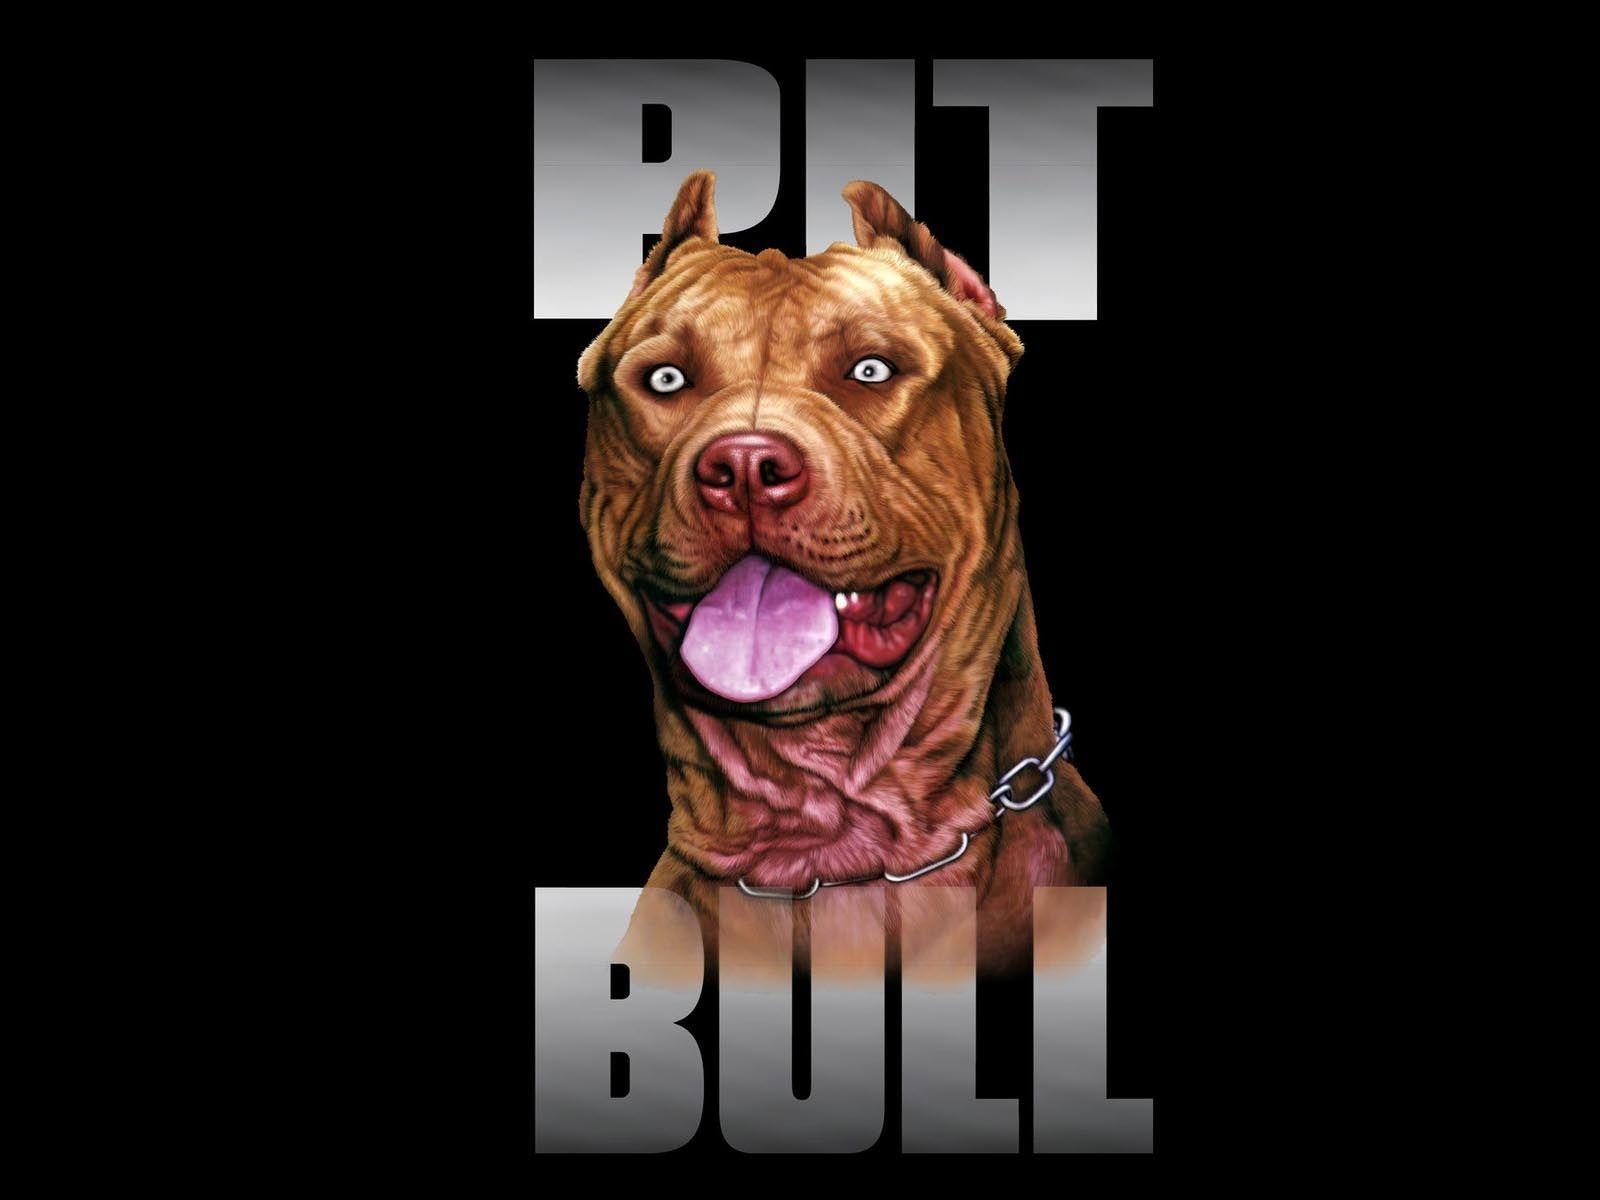 Pitbull Wallpapers Top Free Pitbull Backgrounds Wallpaperaccess